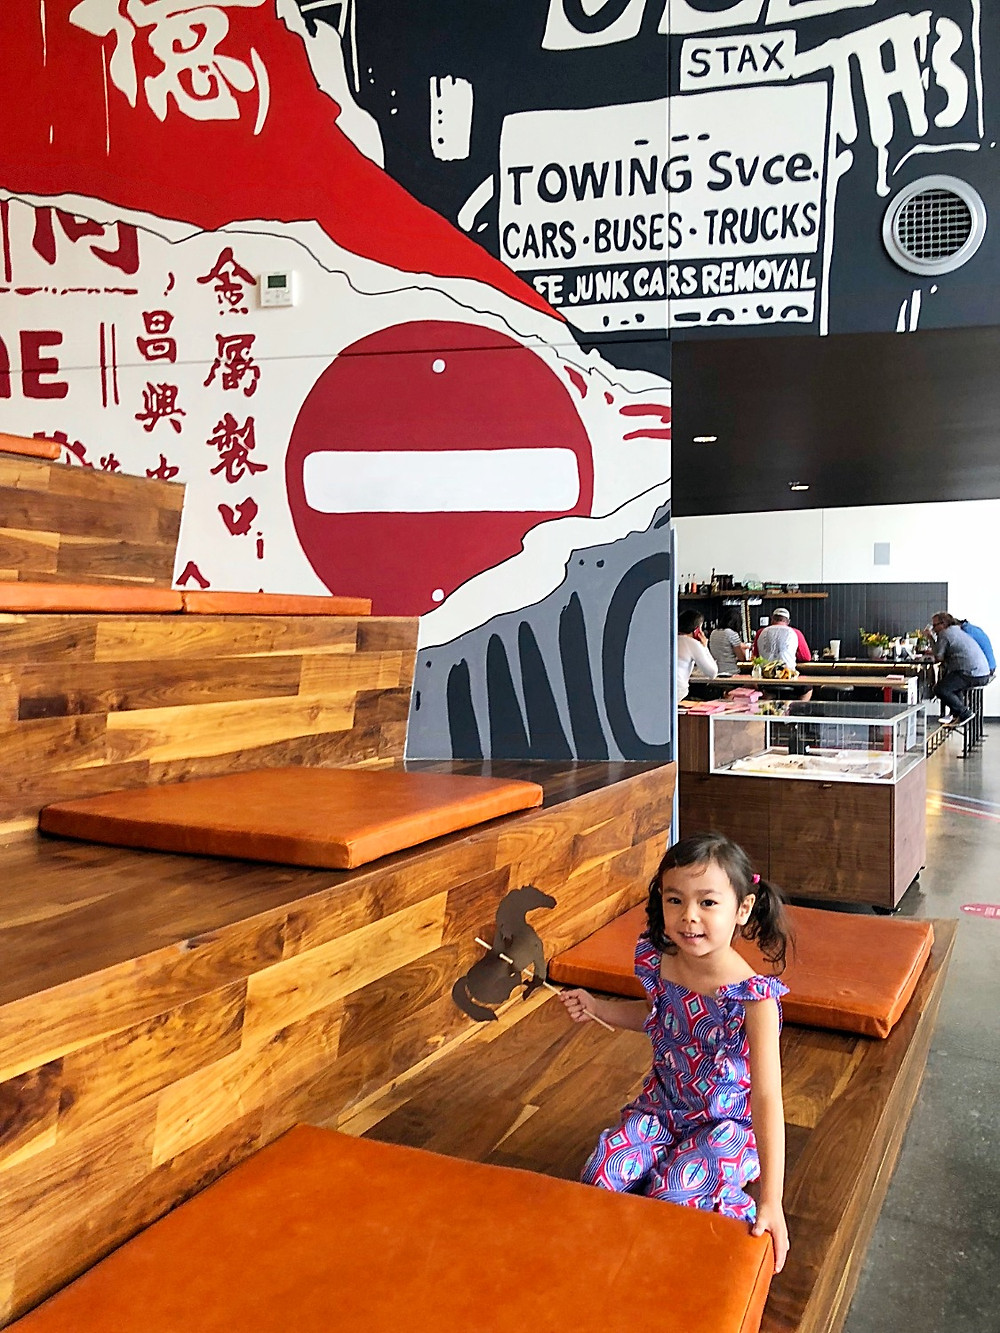 Denver with kids, RiNo, River North Arts District, Crush Walls, Denver art, Kate Moss, James Dean, Zeppelin Station, Big Trouble